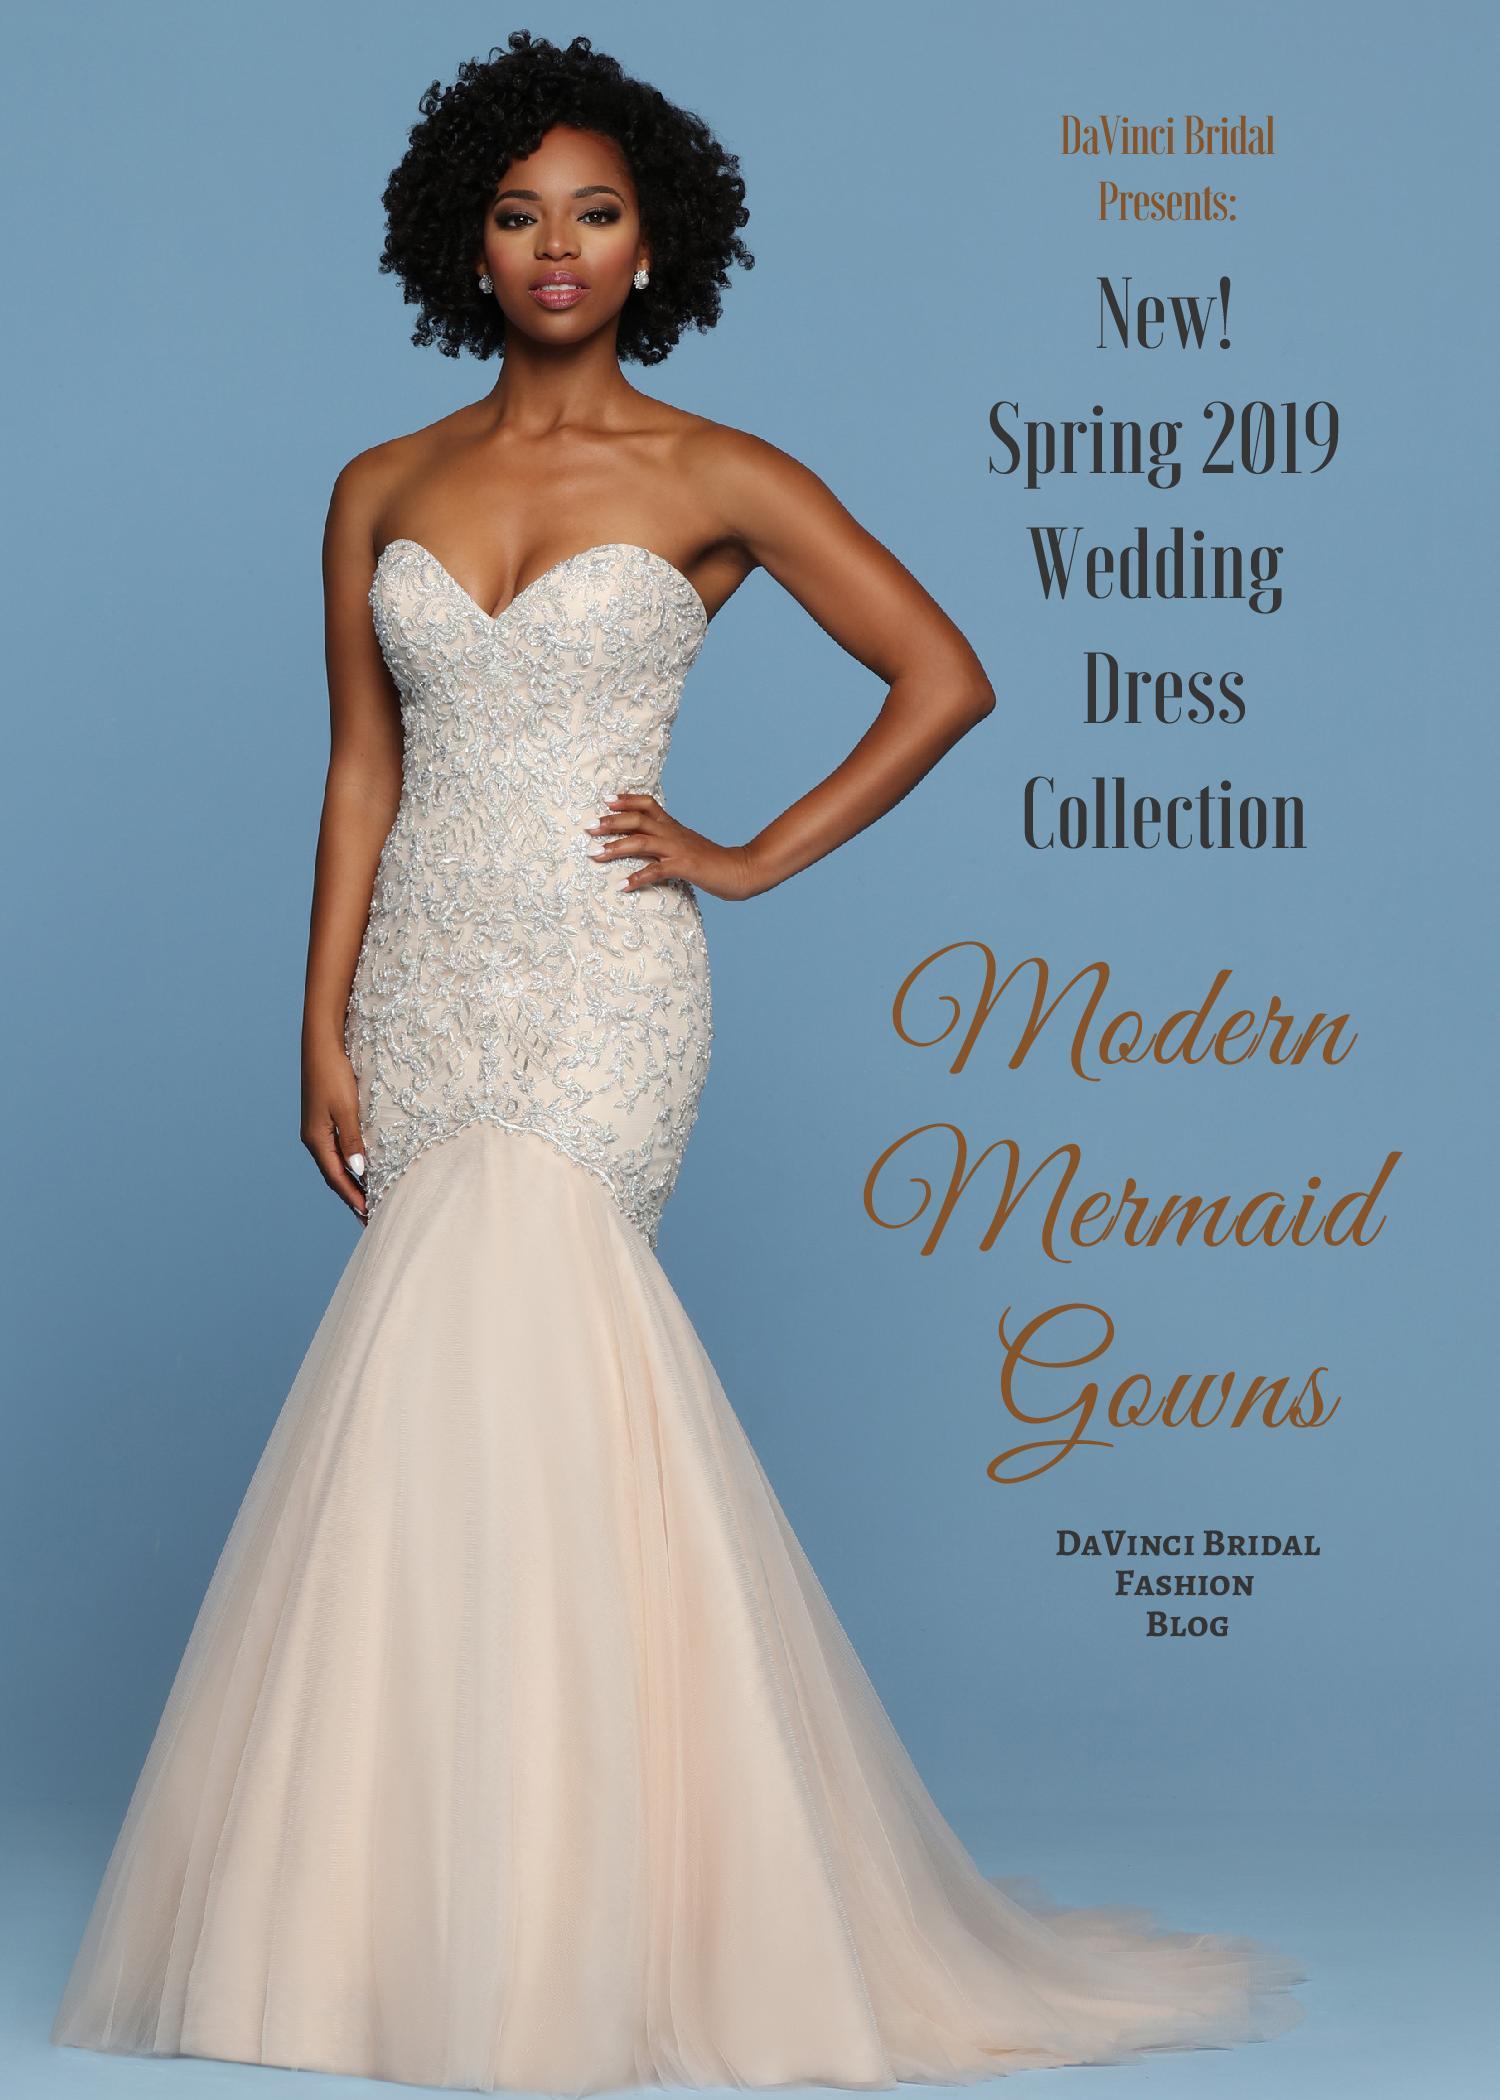 5793e8953ec87 Wedding Gowns for 2019 Modern Mermaid Wedding Dress Collection